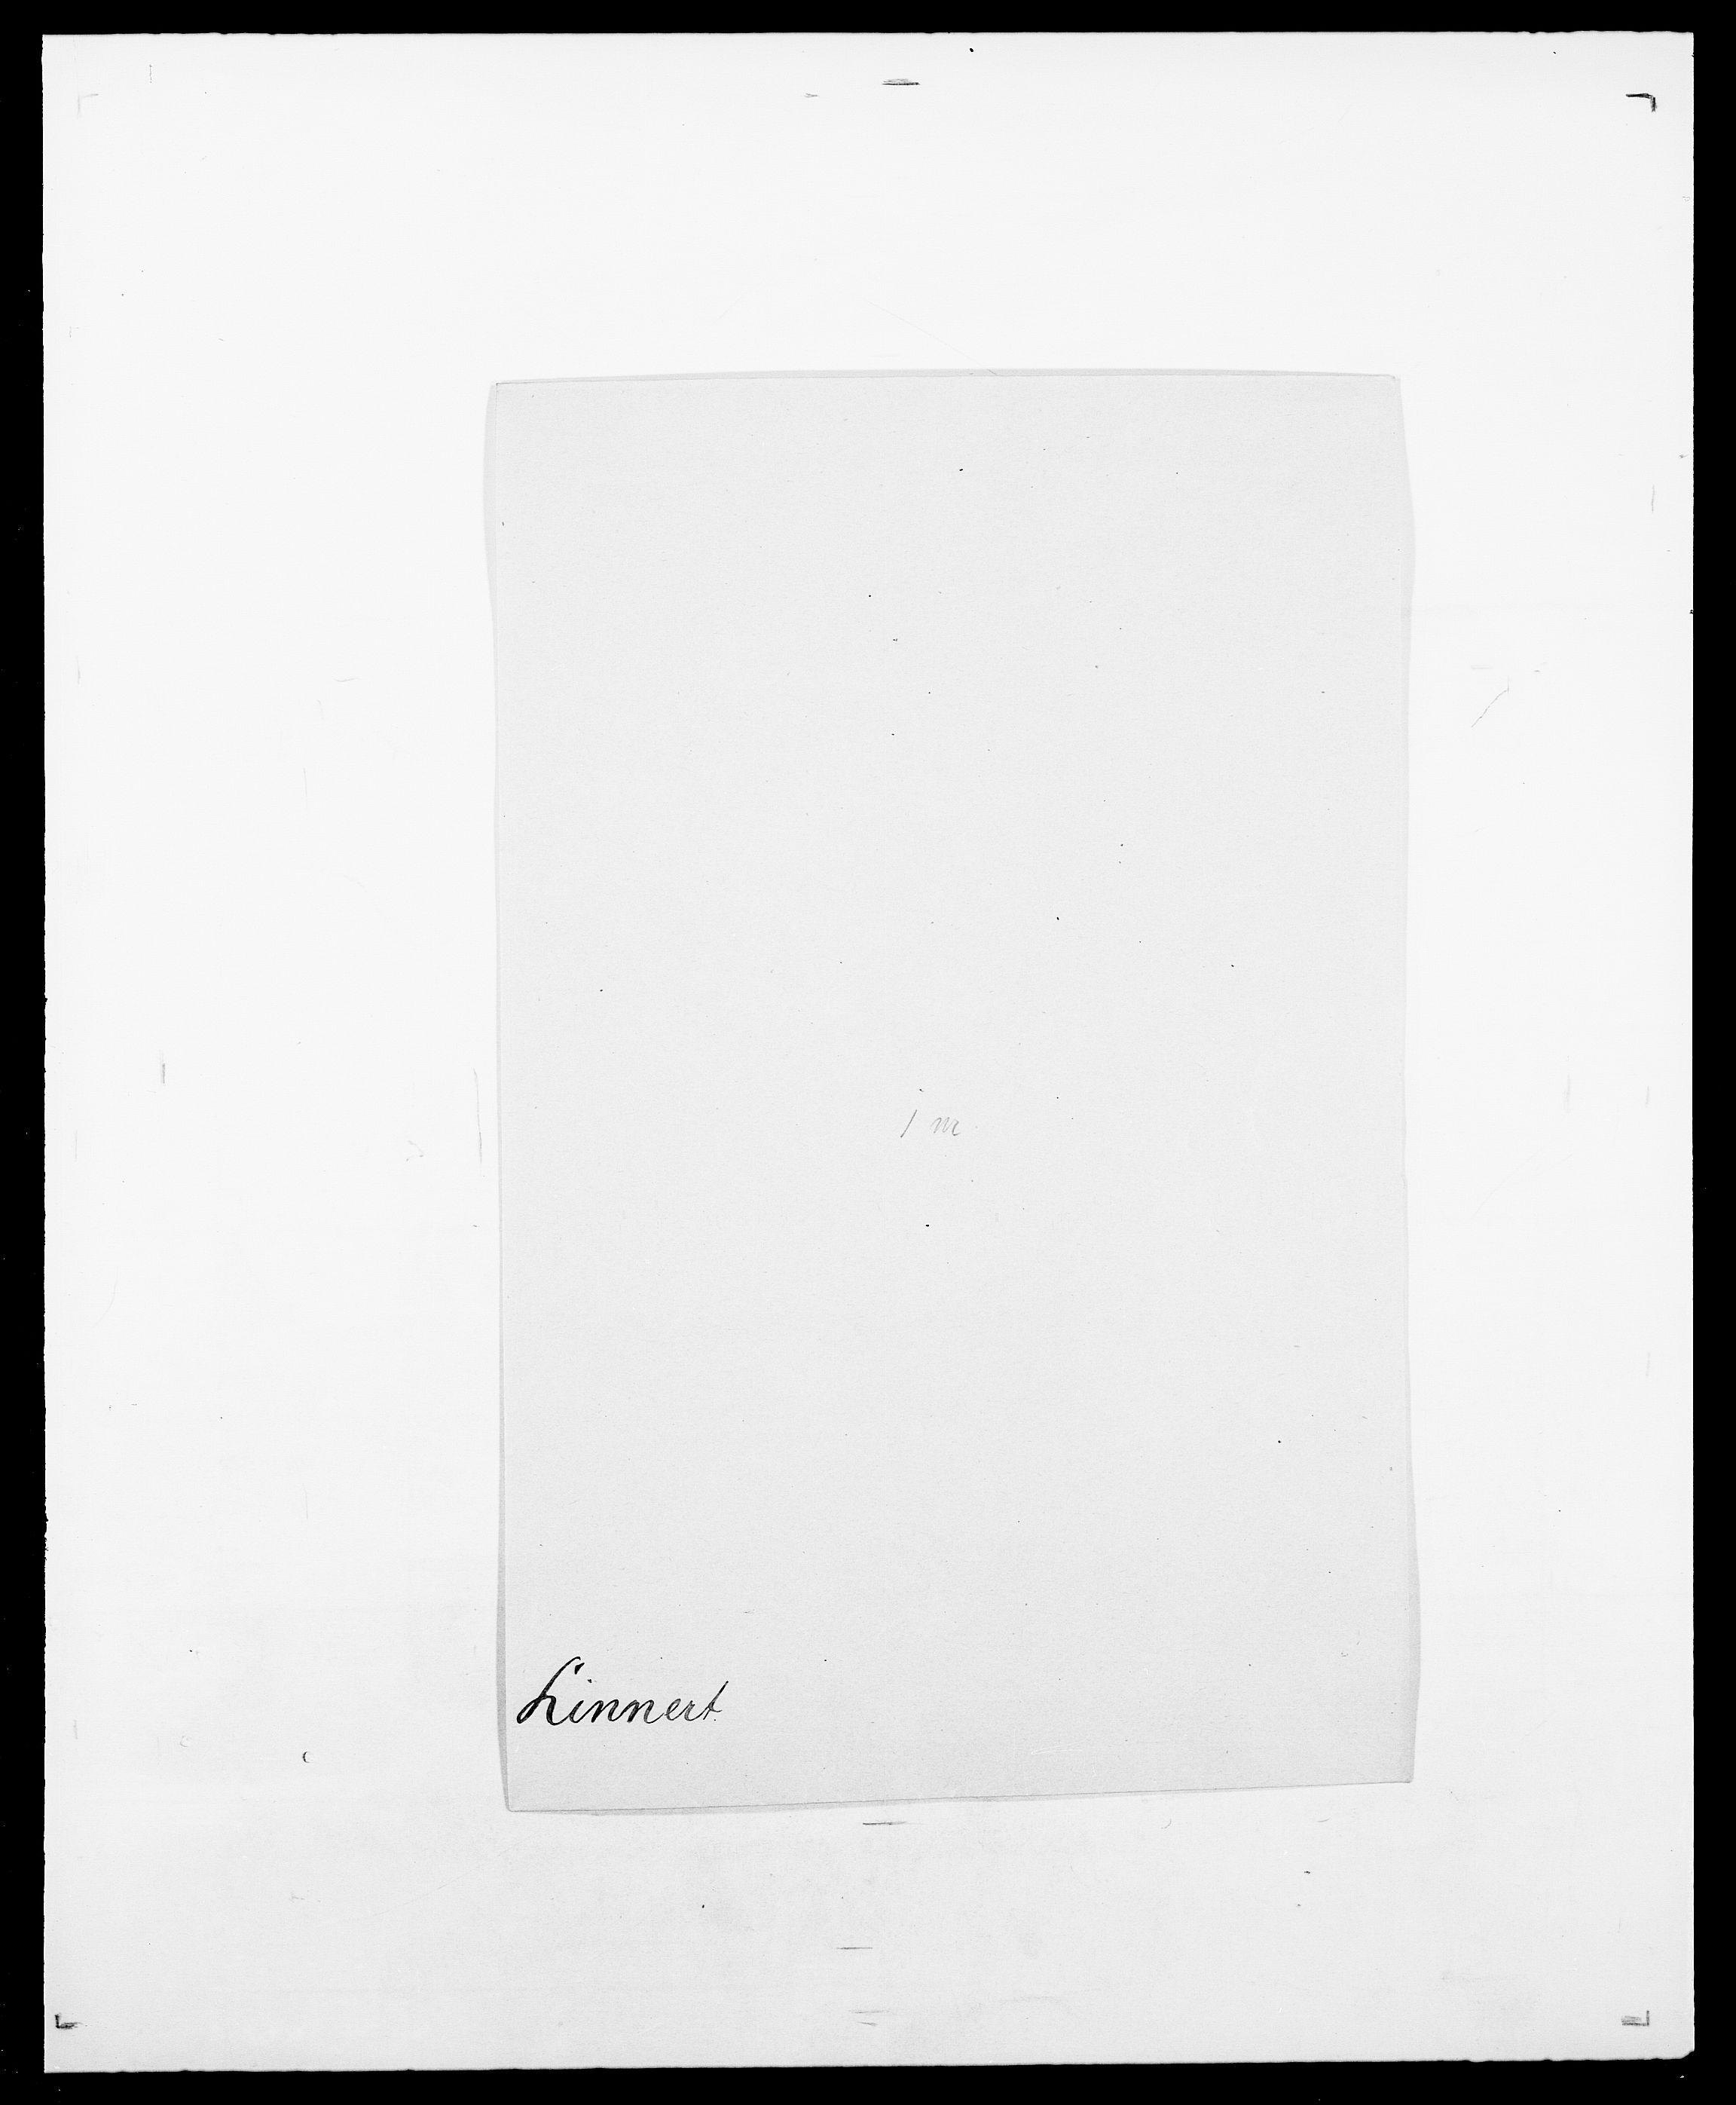 SAO, Delgobe, Charles Antoine - samling, D/Da/L0023: Lau - Lirvyn, s. 664